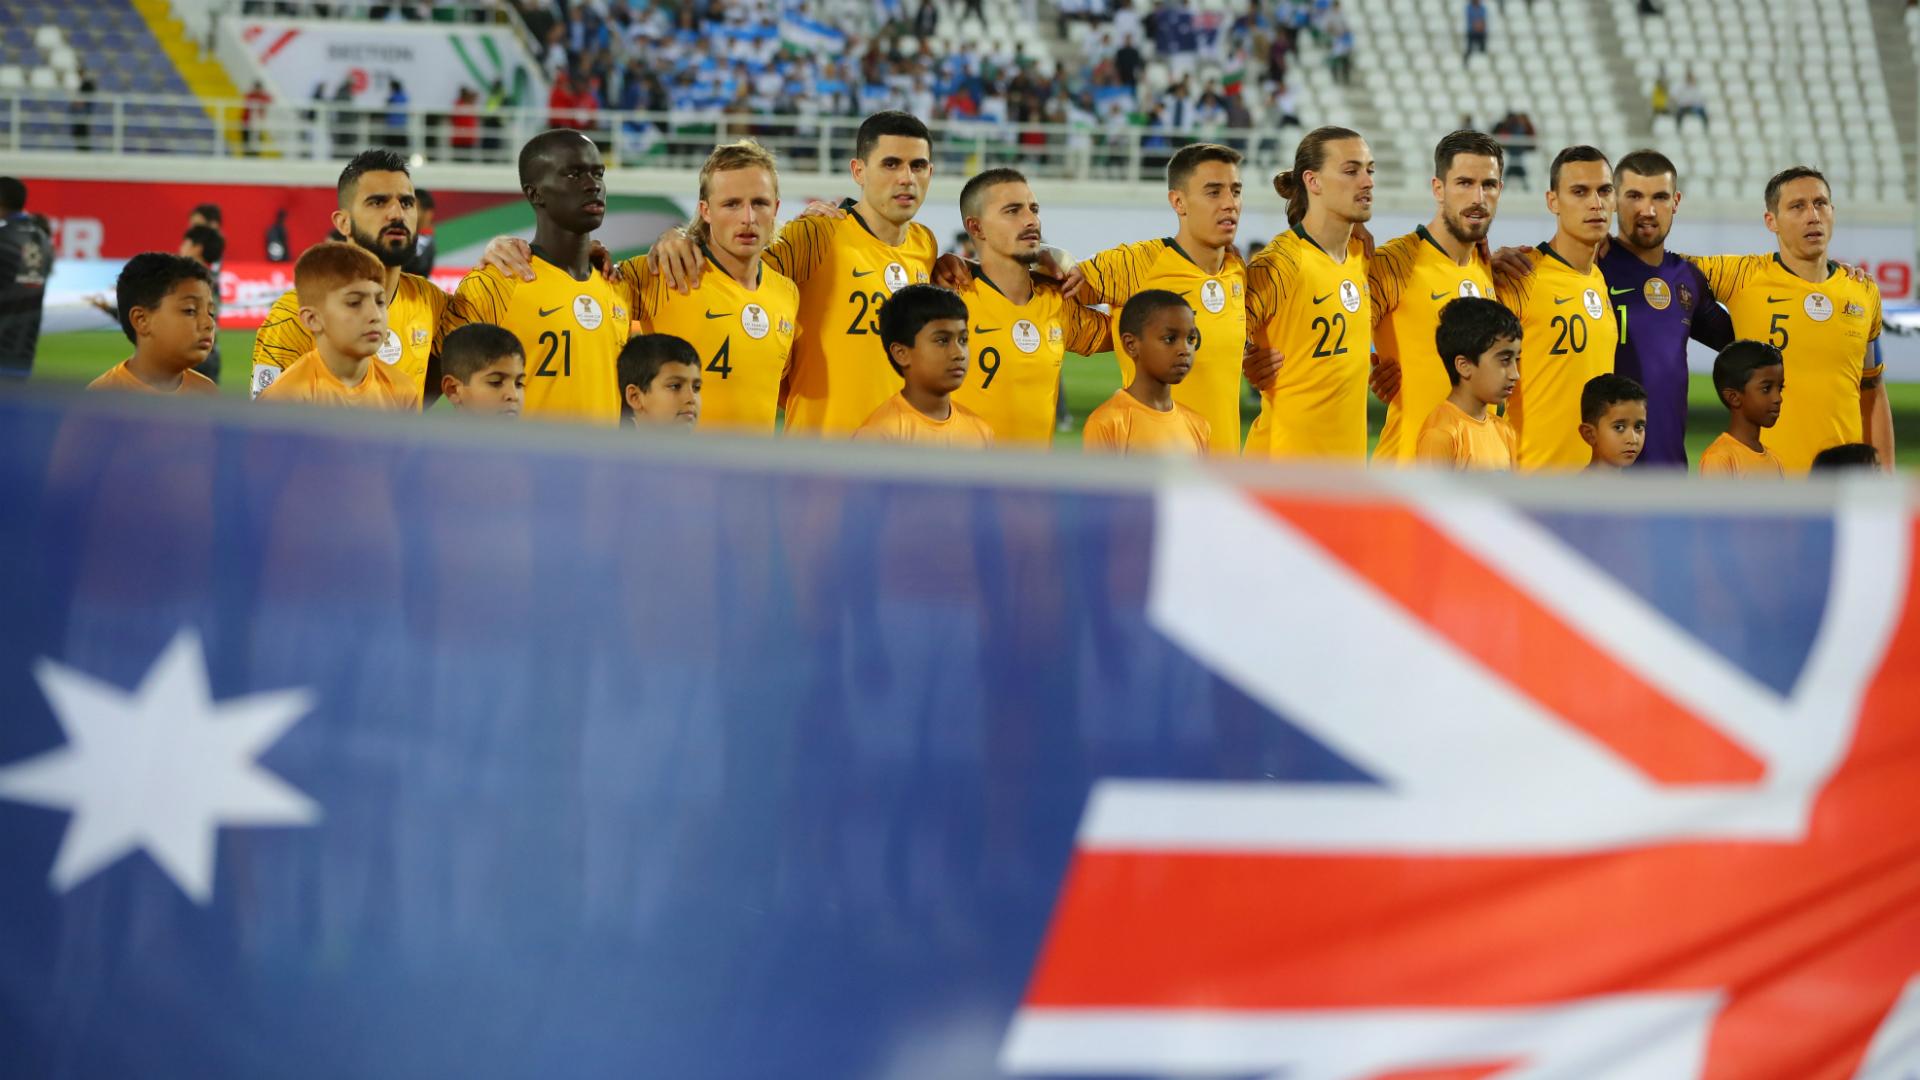 Socceroos drawn alongside Jordan for 2022 World Cup qualifying